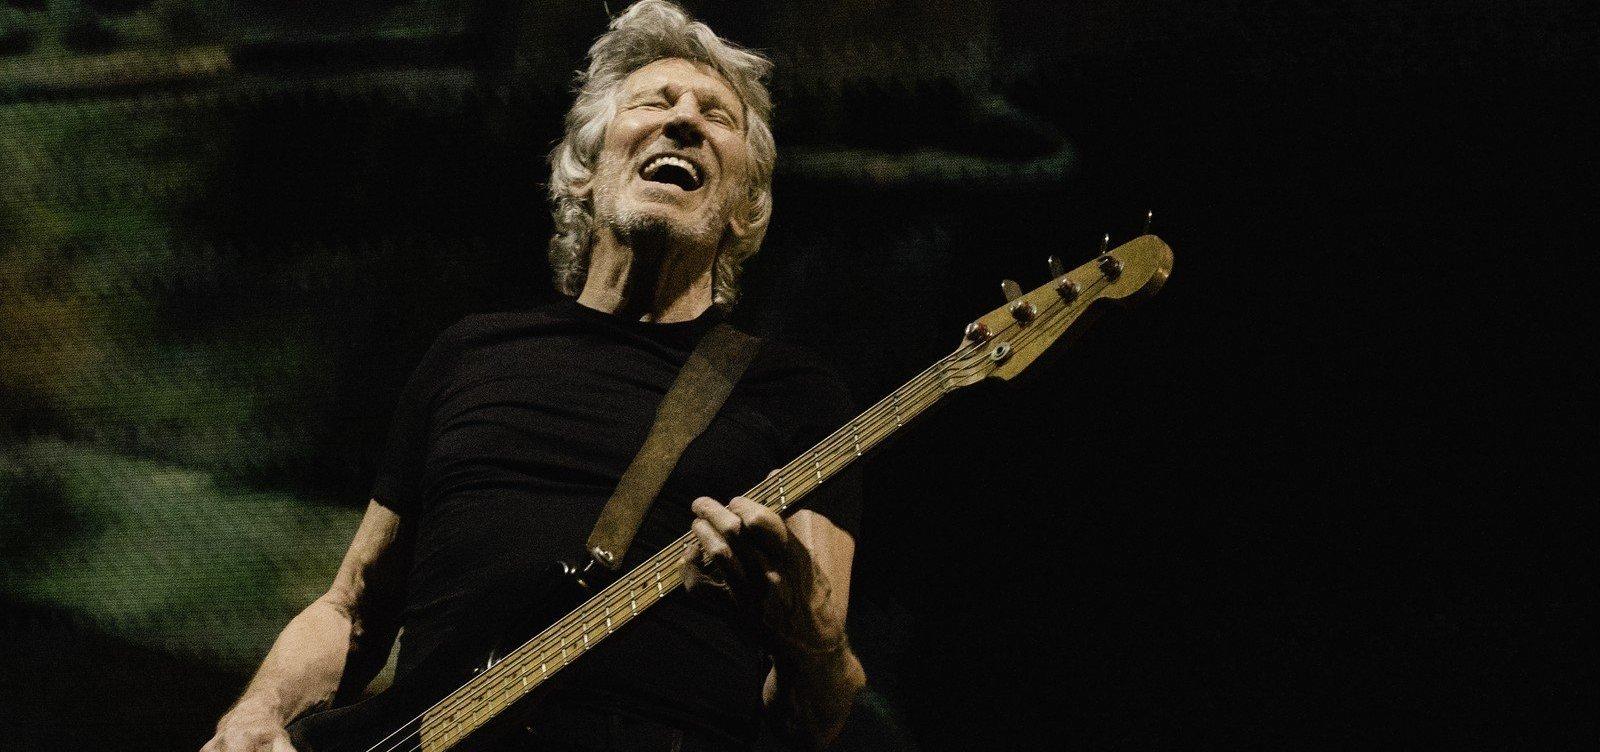 [Roger Waters quer visitar Lula na prisão antes de deixar Brasil]